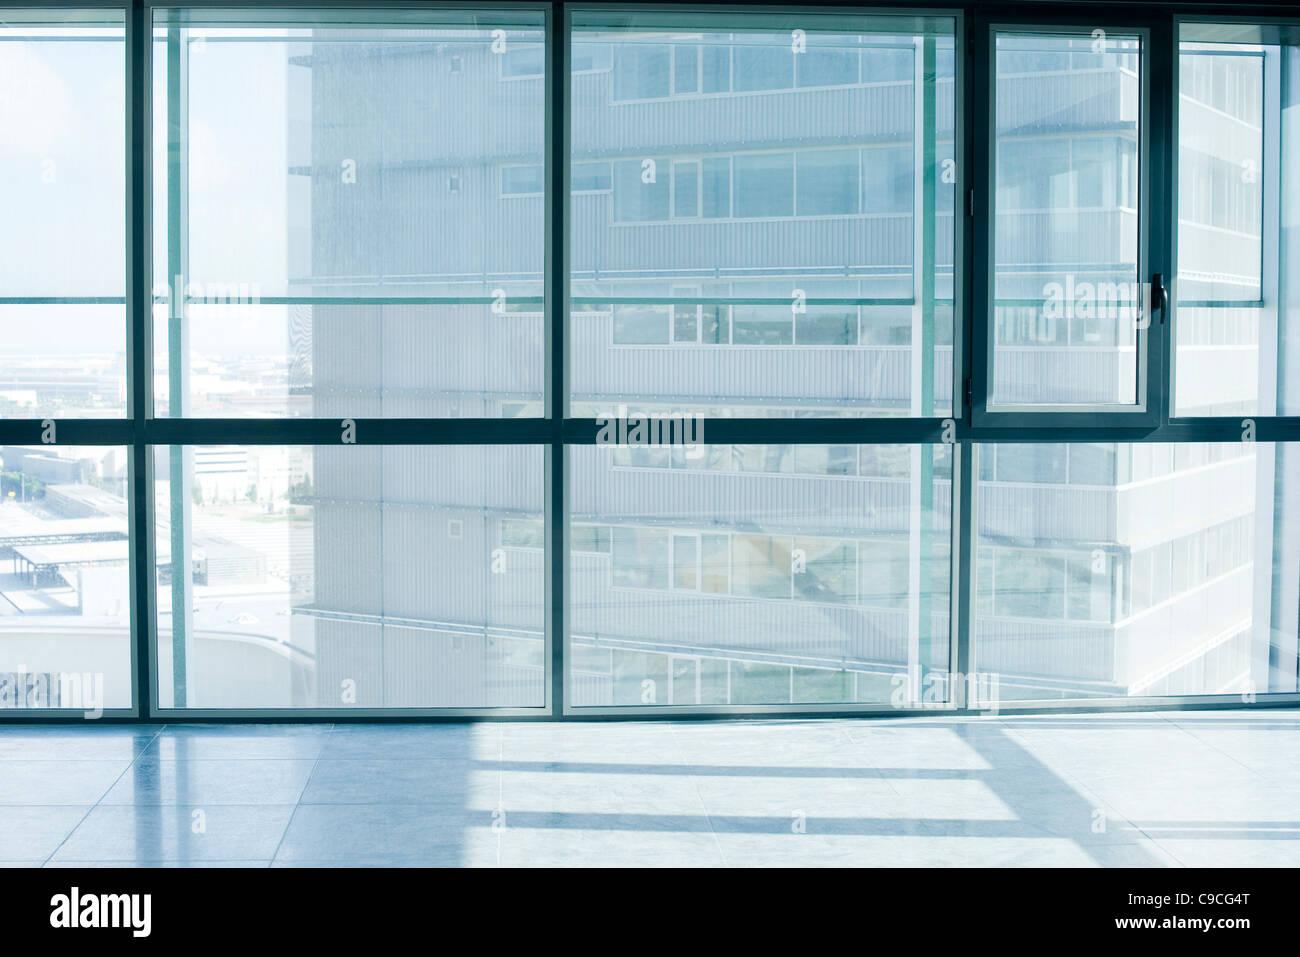 Empty room with bay windows - Stock Image